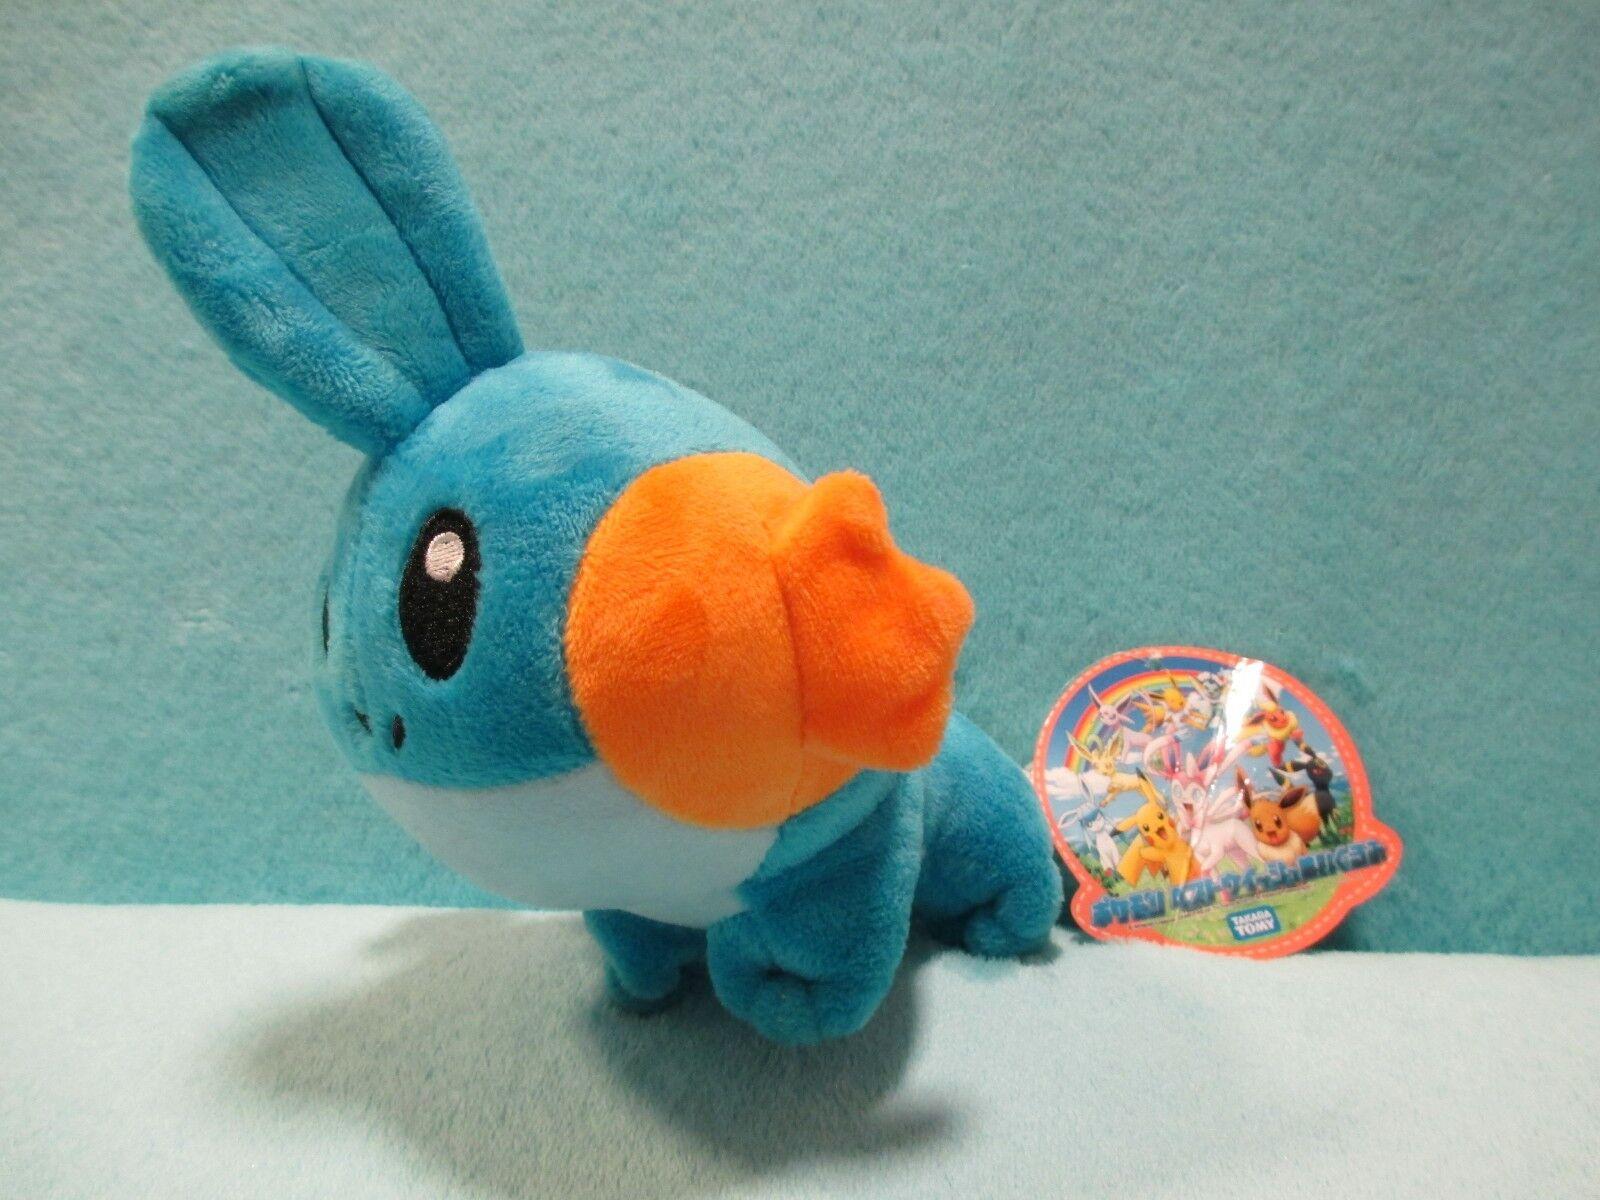 BNWT Japan Takara Tomy Pokemon - Mudkip Marshtomp Fish Soft Plush Toy Doll 7